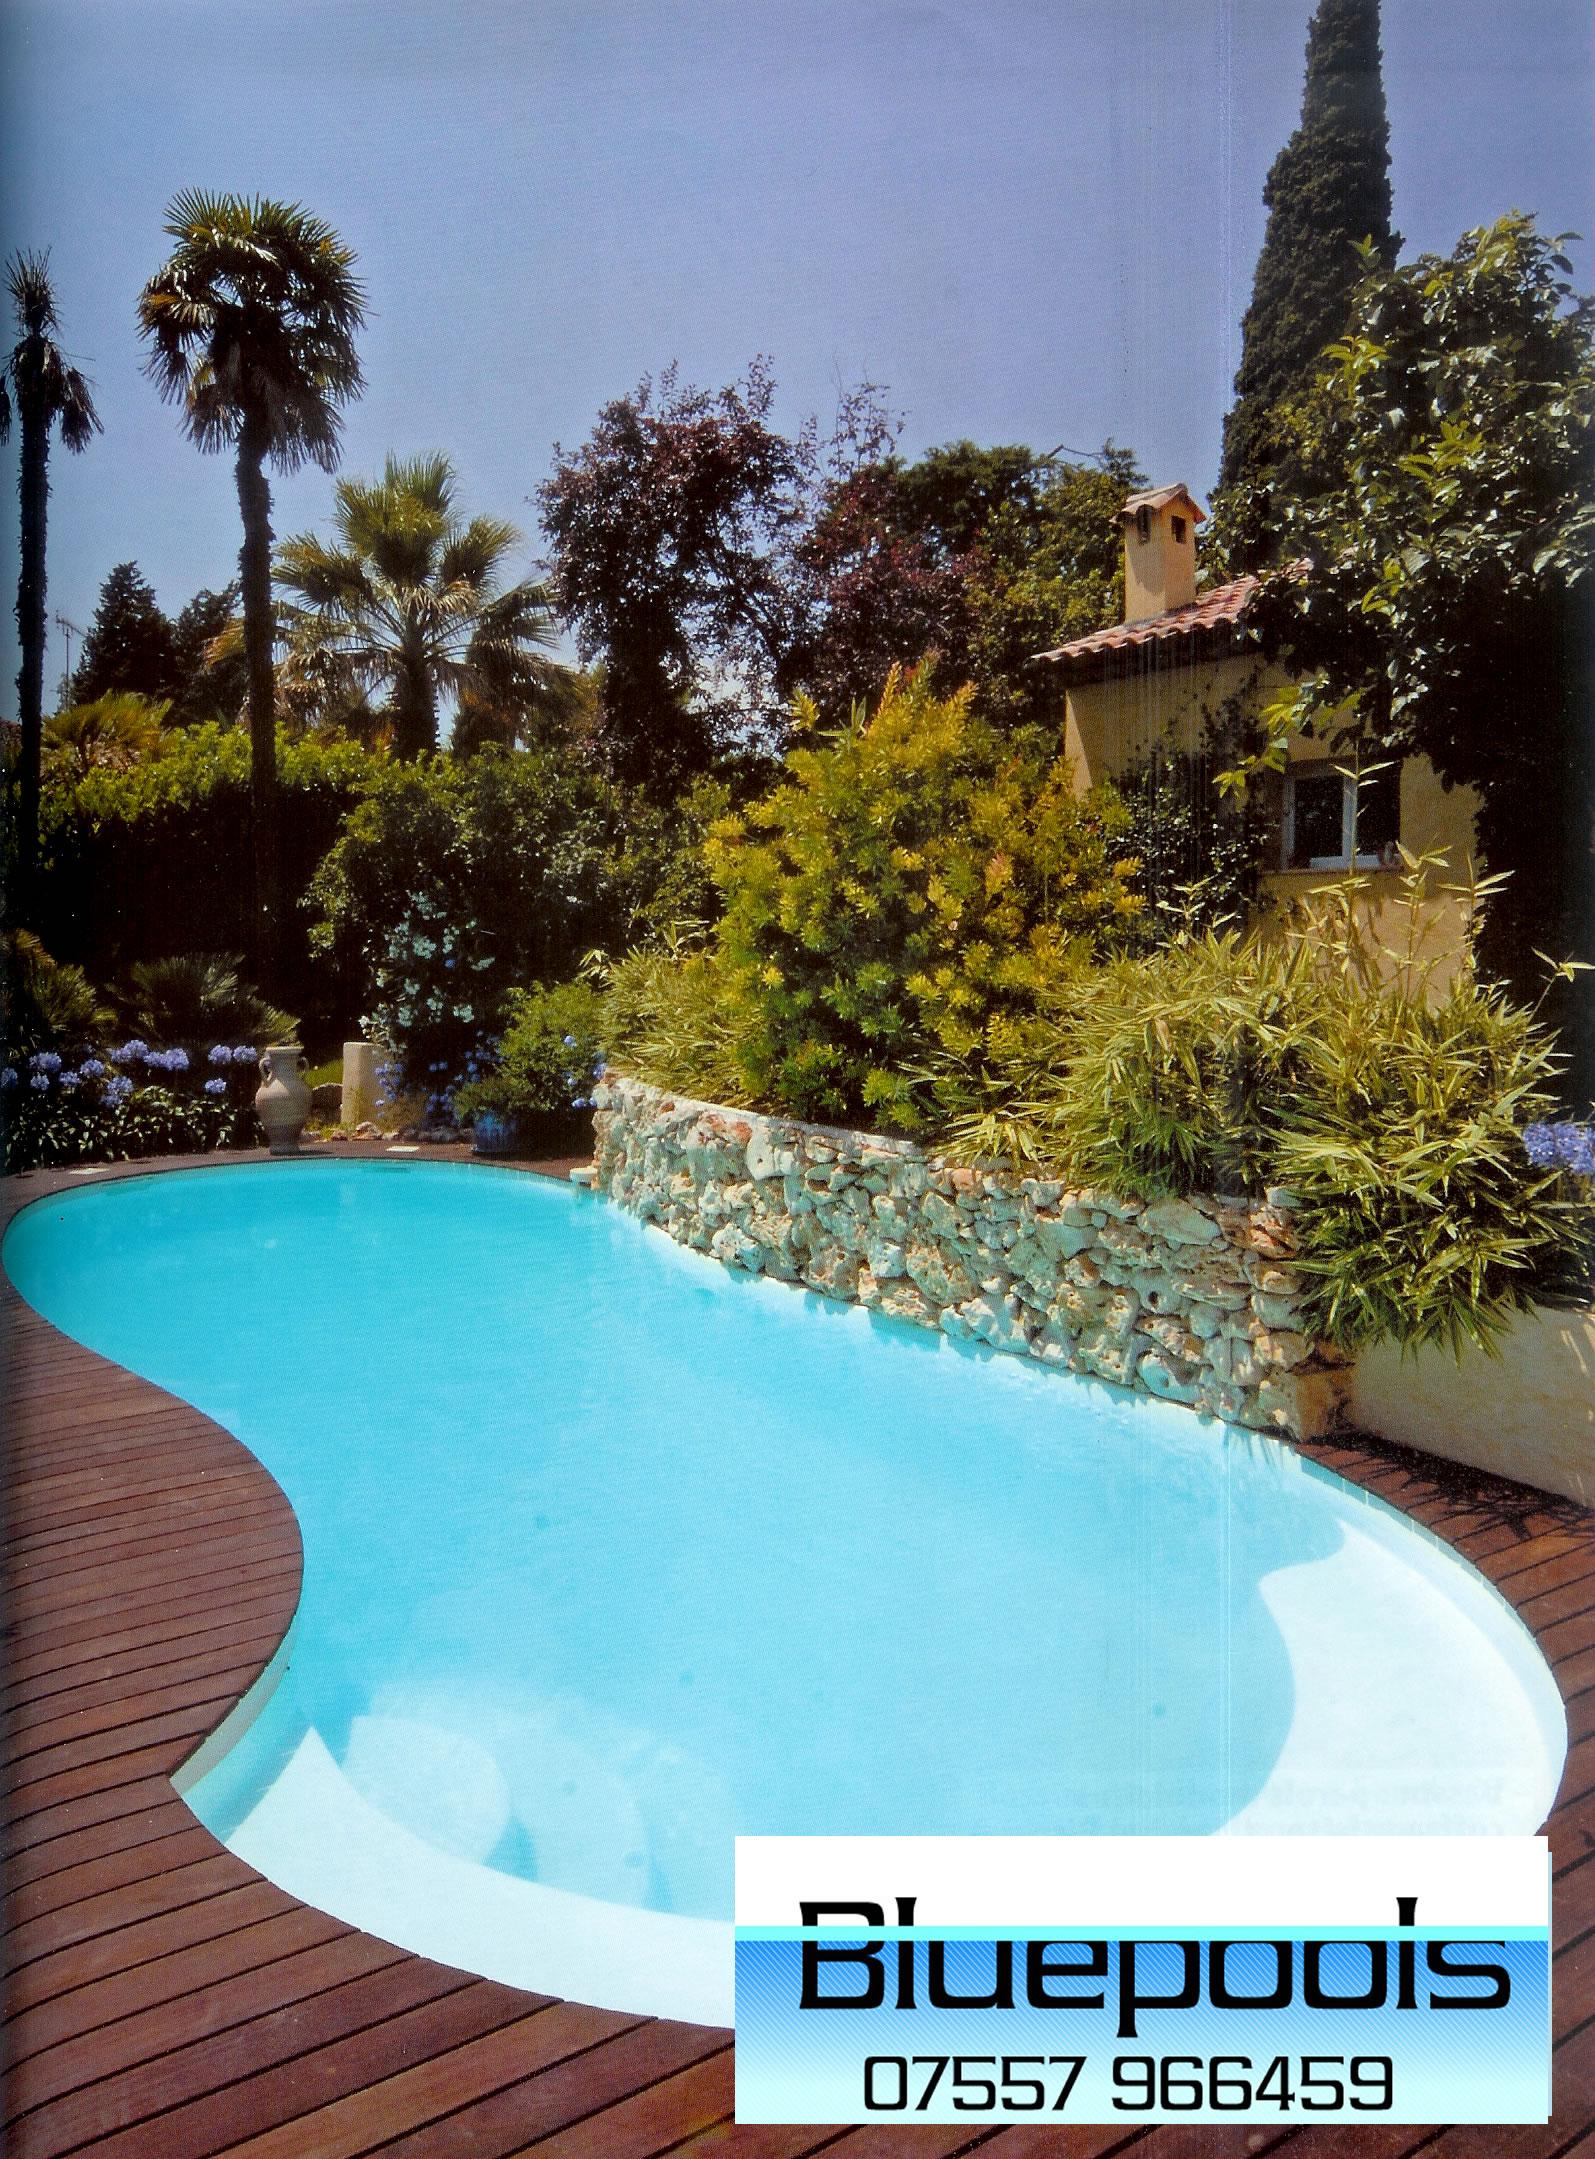 Outdoor pool design for Outdoor pool design uk